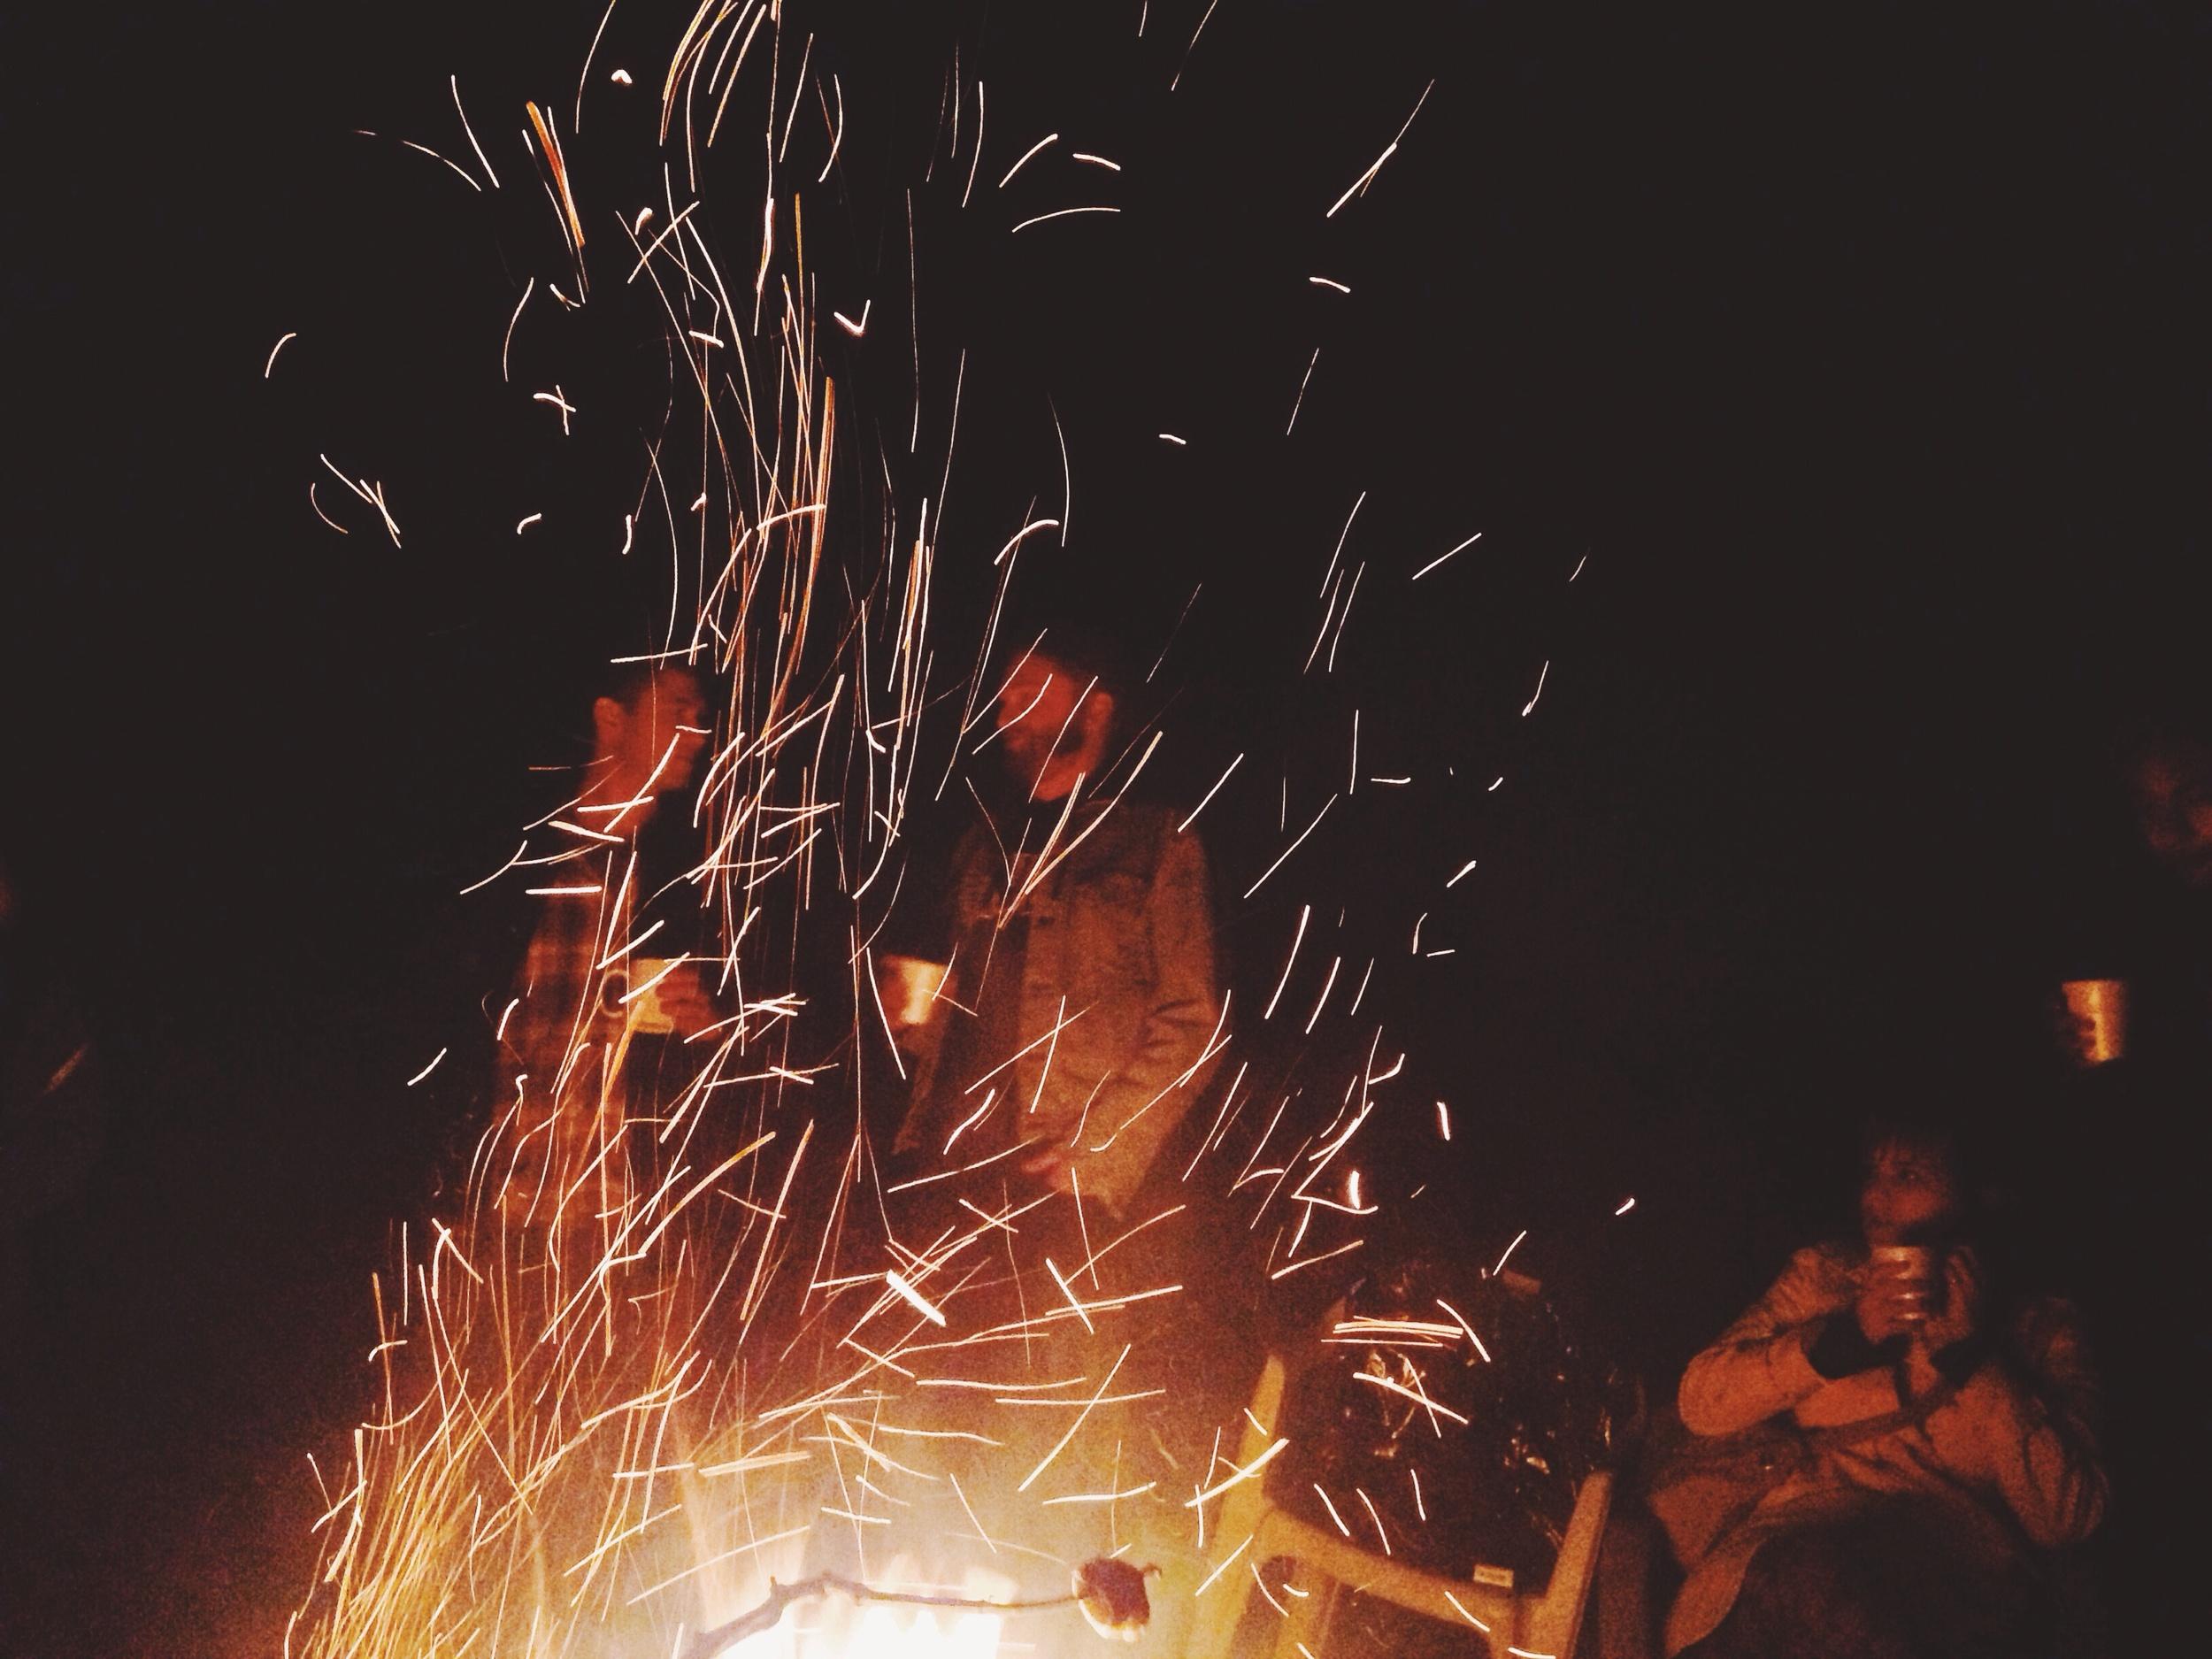 A campfire in Missouri during the Citizen Jane Film Festival.